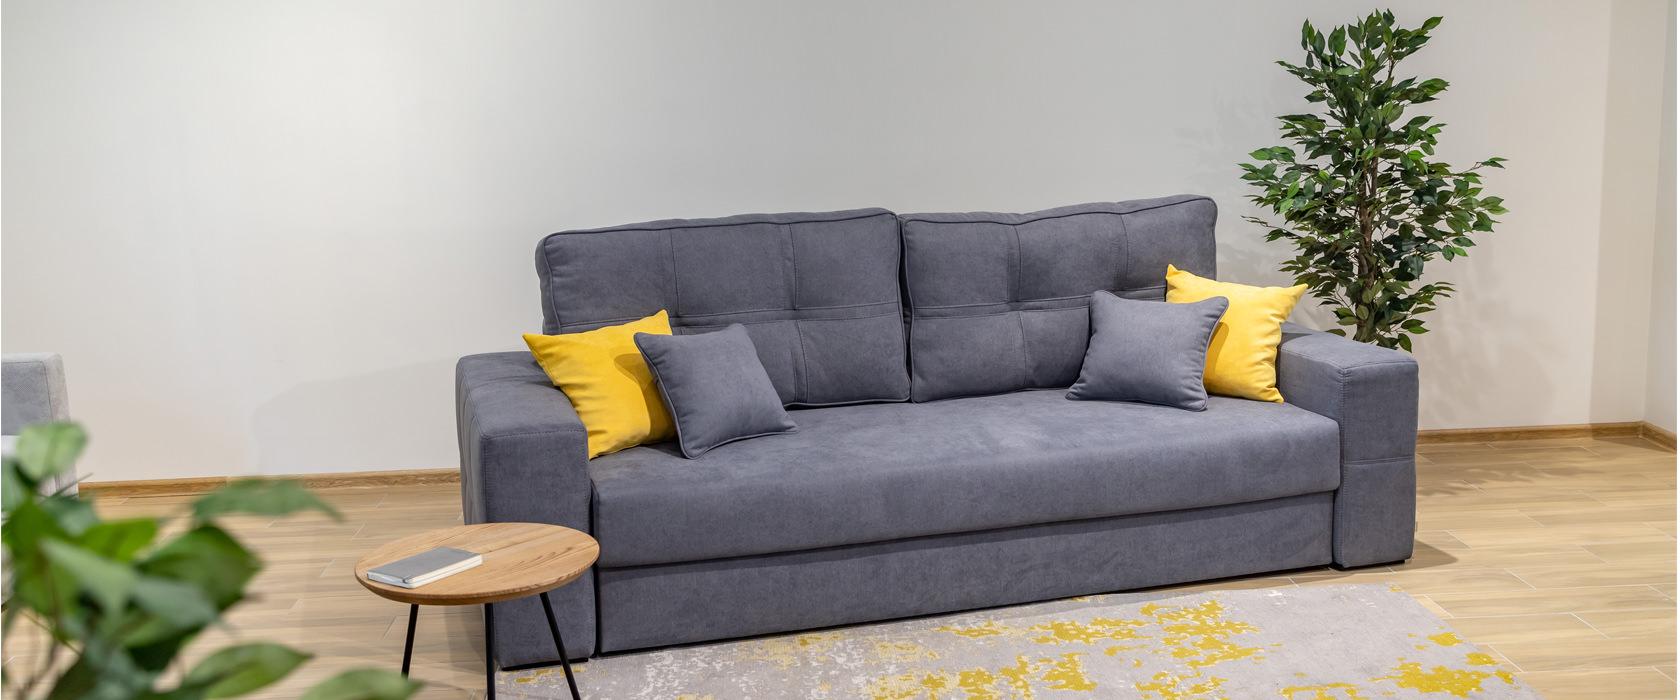 Трехместный диван Matteo - Фото 1 - Pufetto